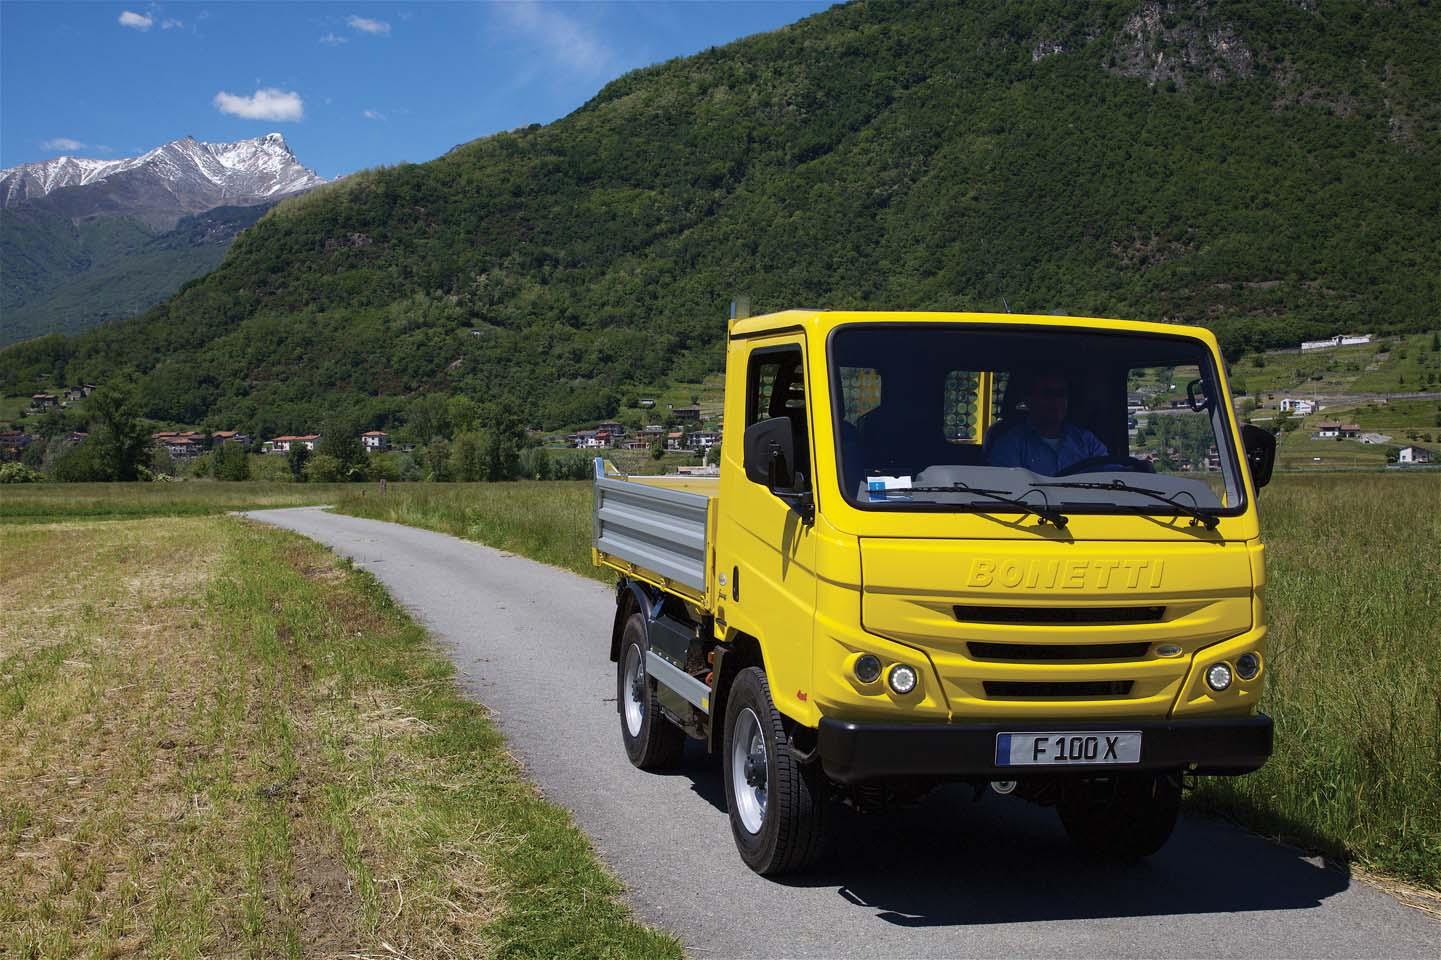 Bonetti 4x4 F100X Euro 6 in alta Lombardia